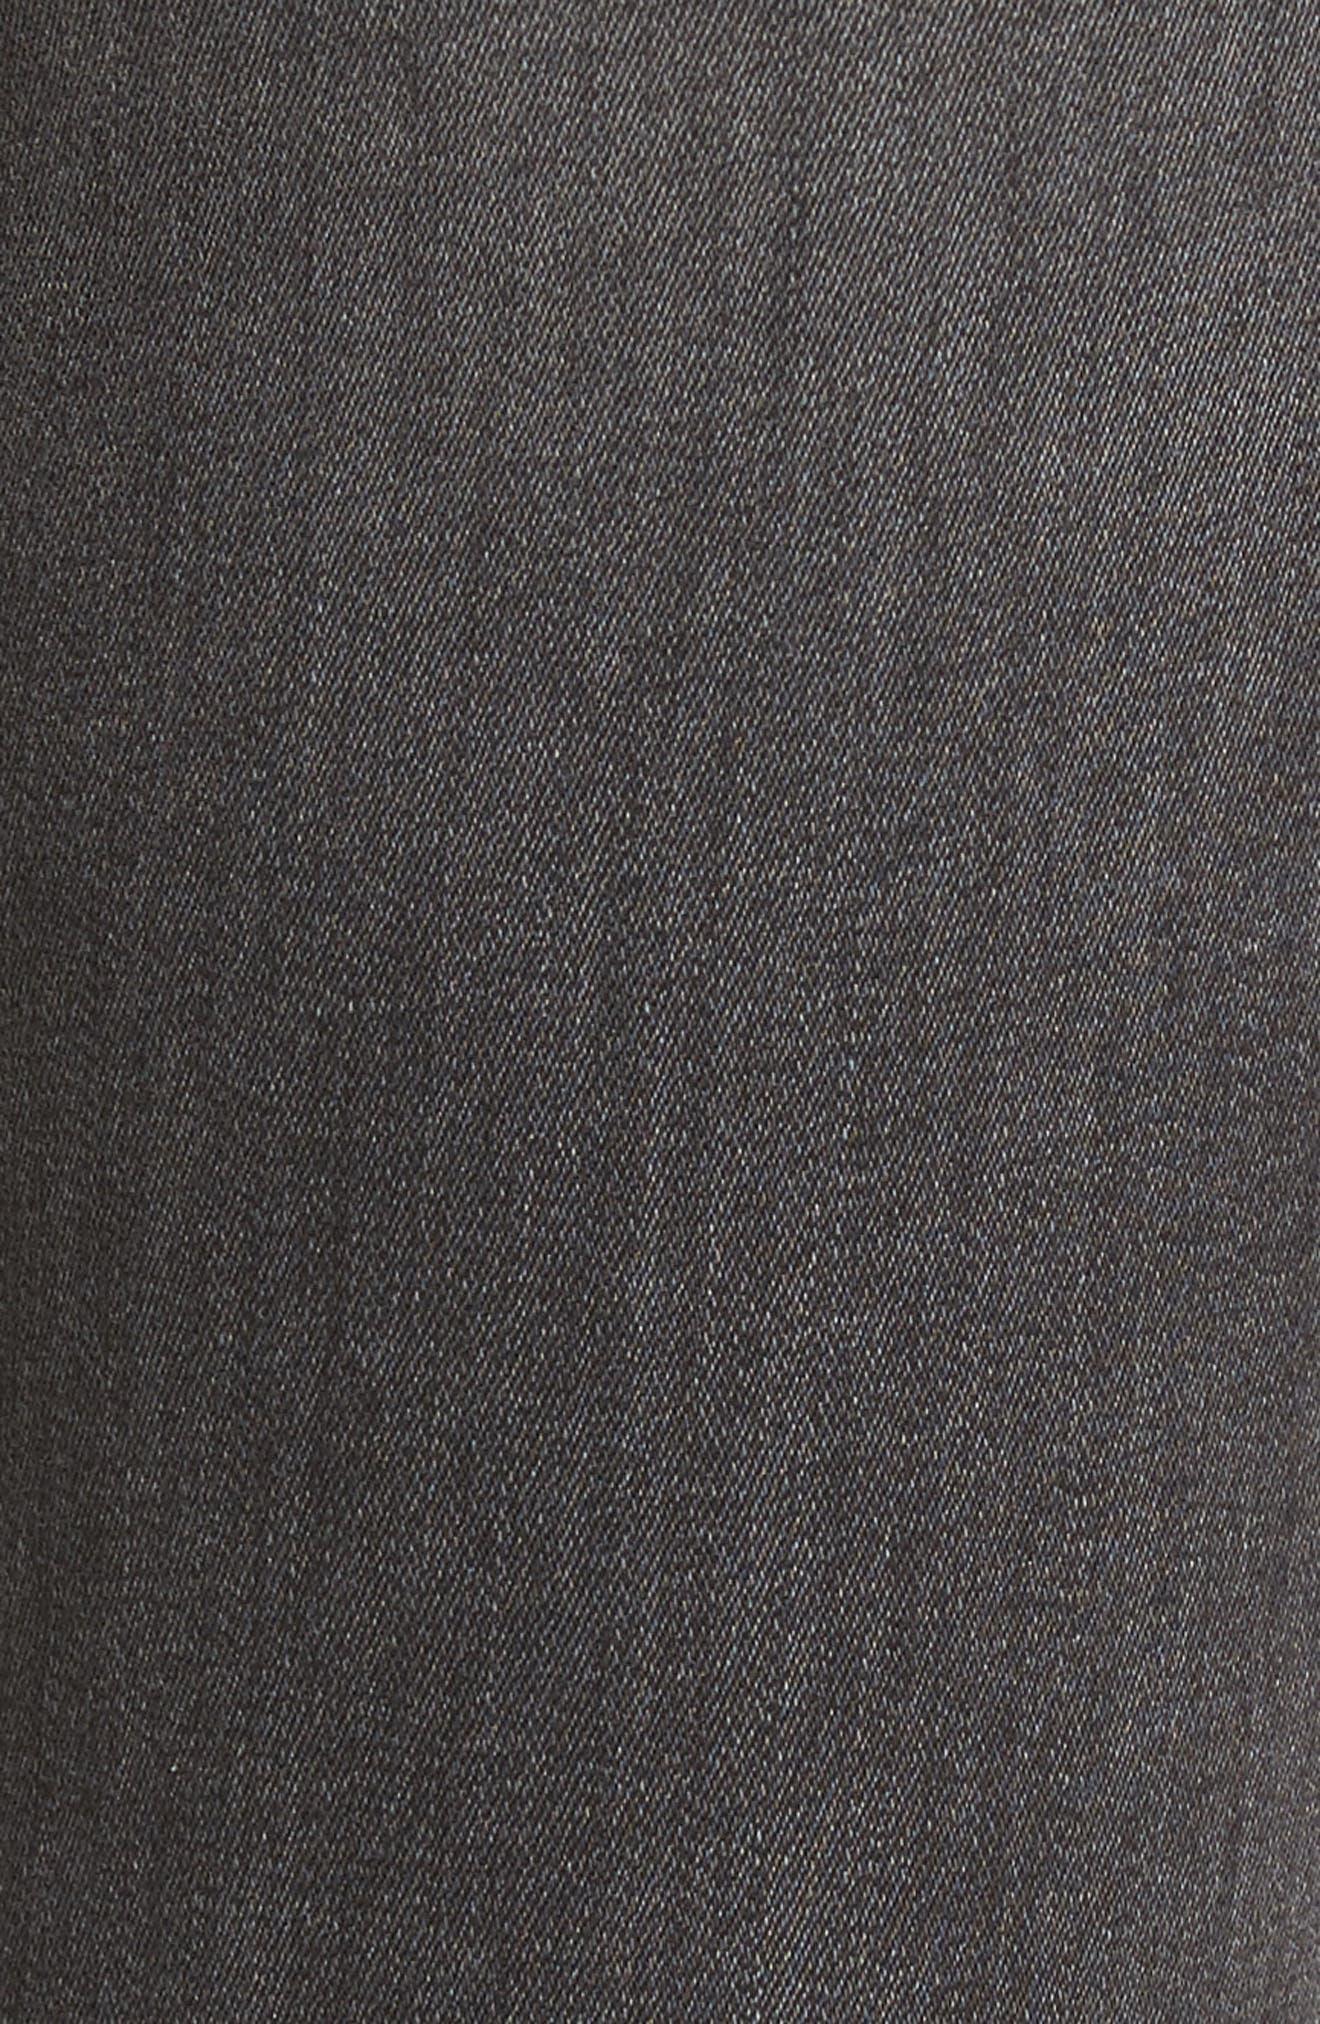 Farrow High Waist Instaslim Skinny Jeans,                             Alternate thumbnail 5, color,                             Whitney